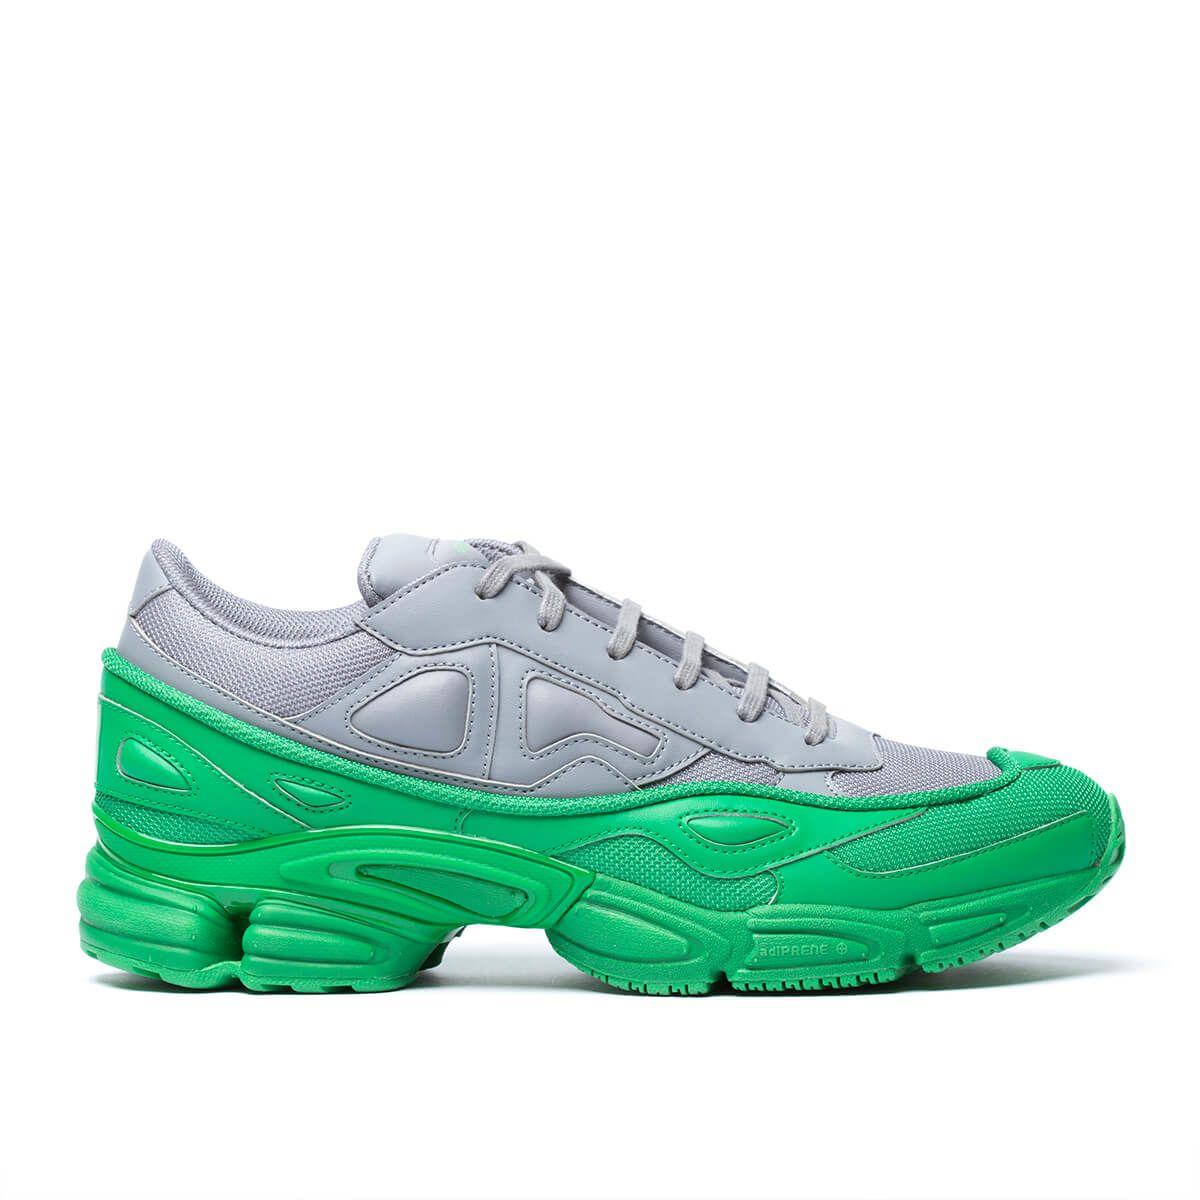 adidas by raf simons -  Ozweego Sneakers